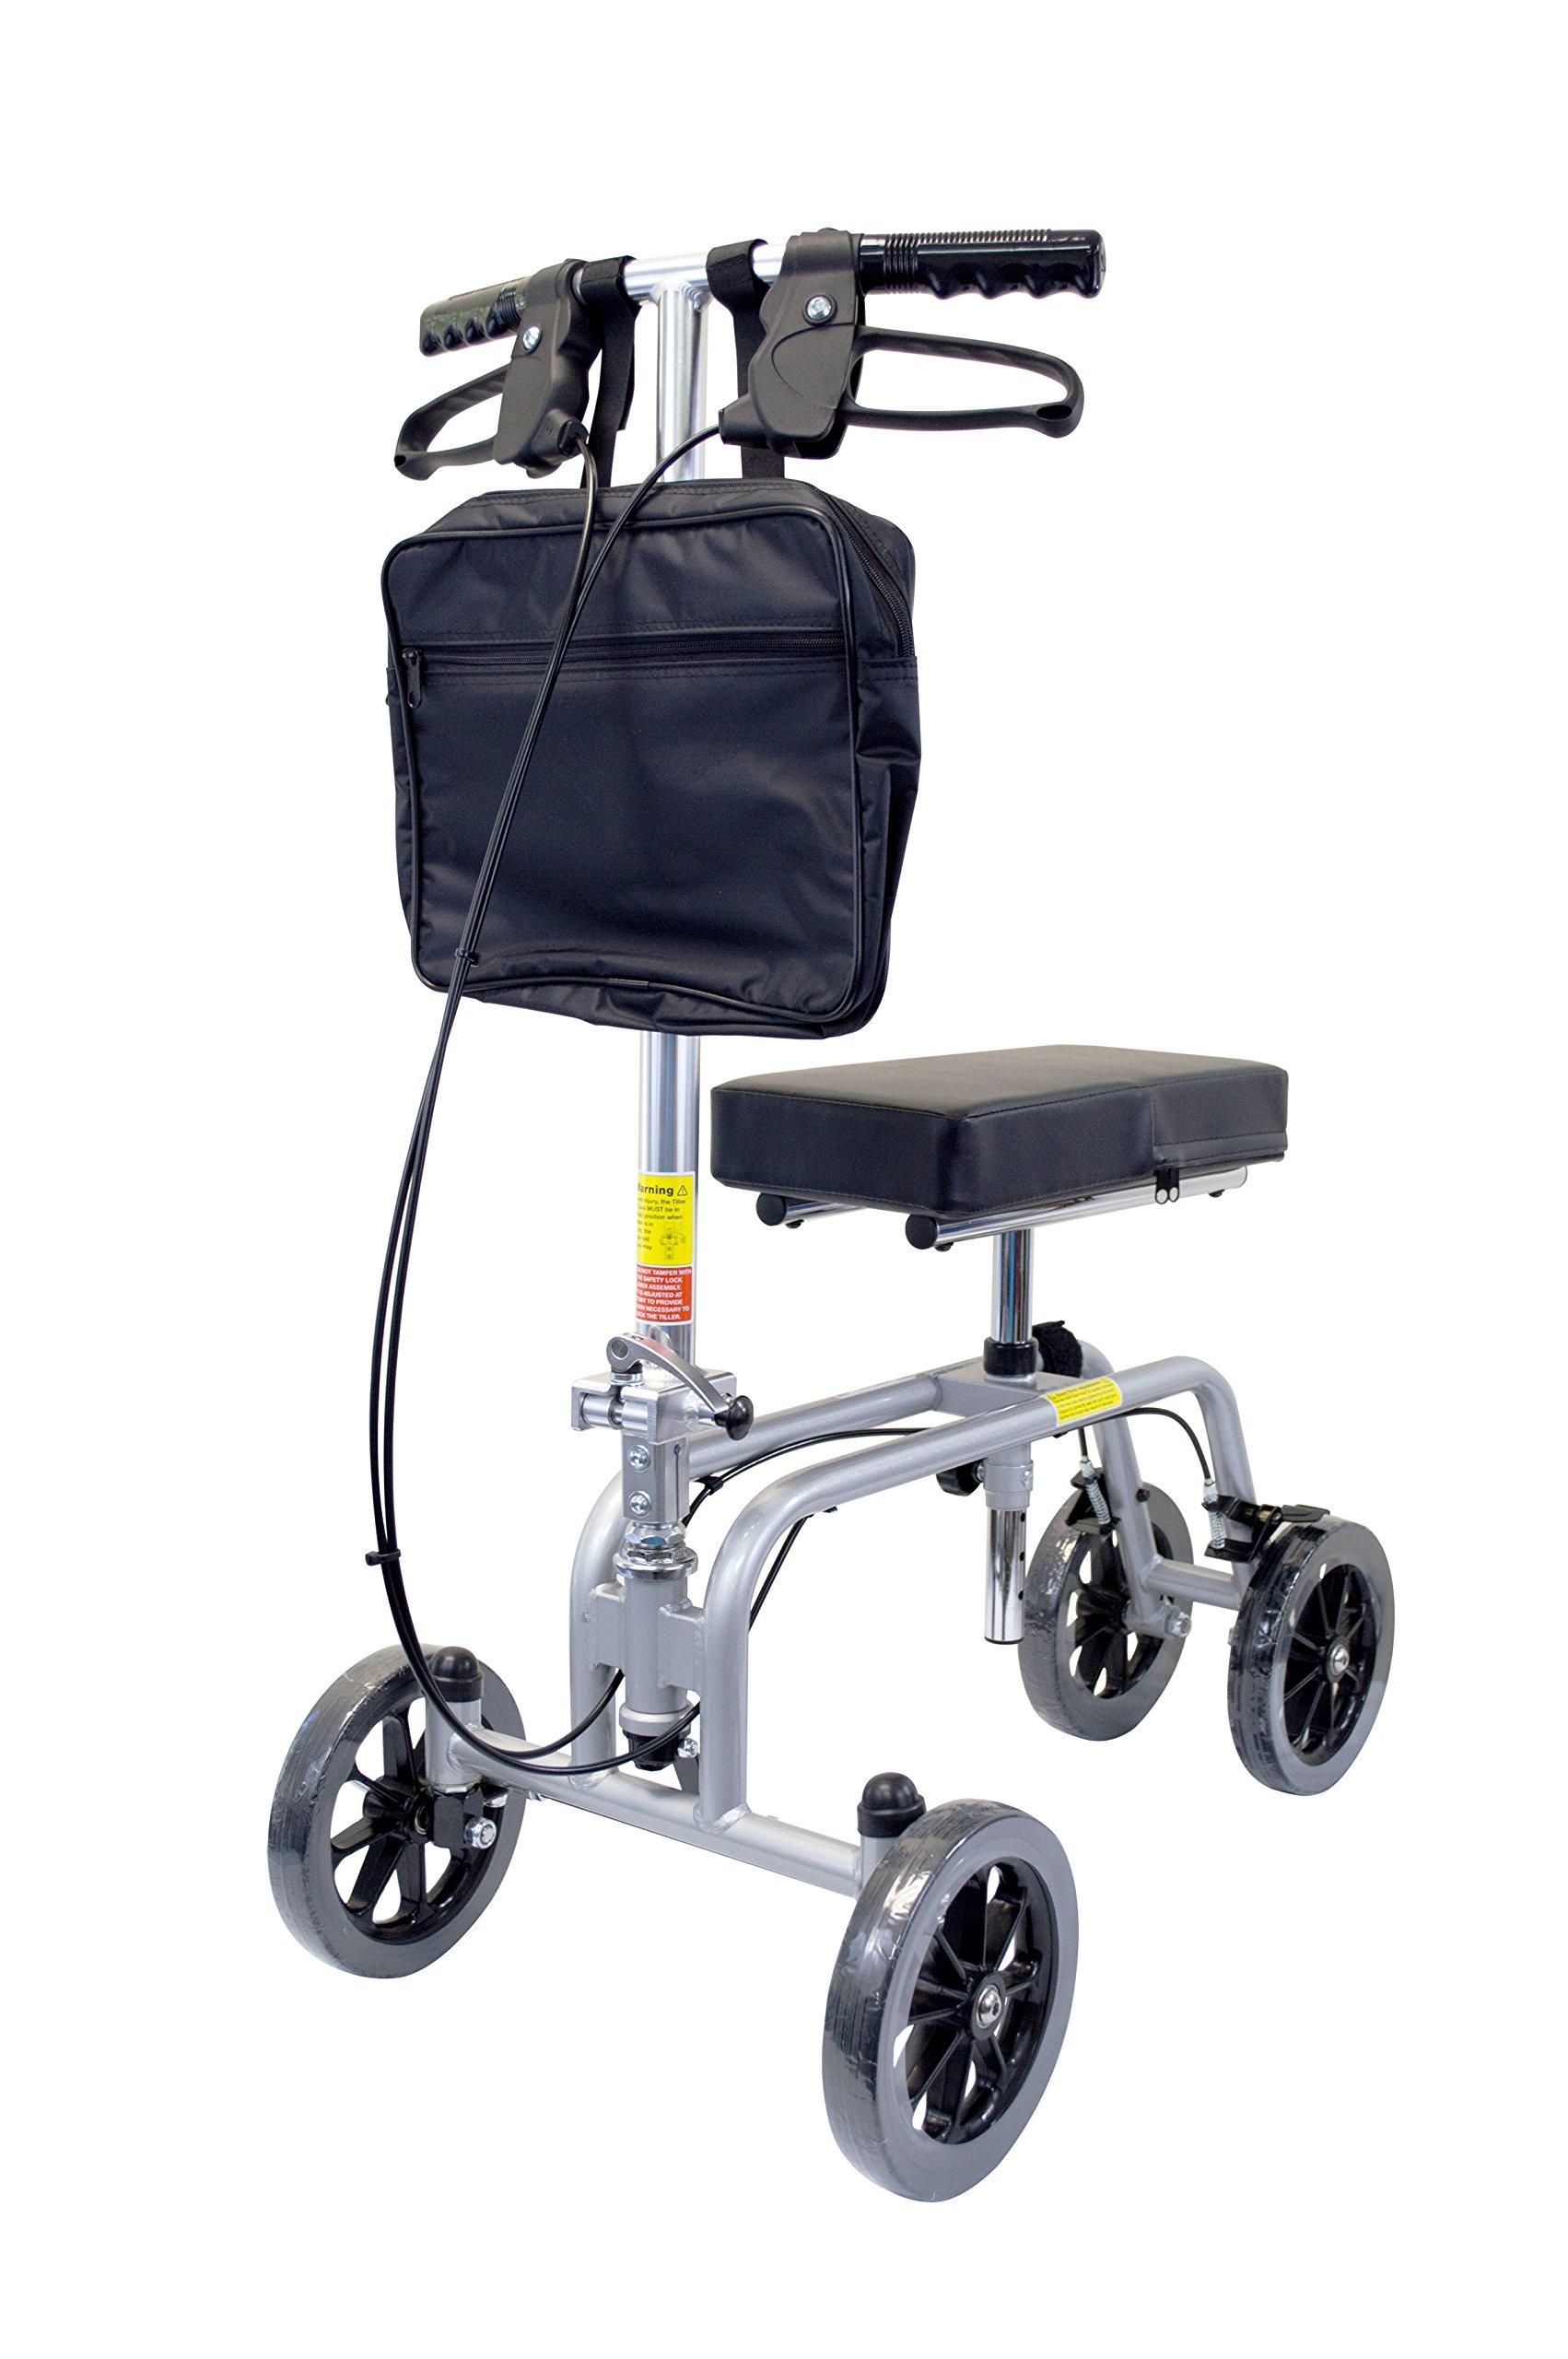 Essential Medical Supply Free Spirit Knee and Leg Walker